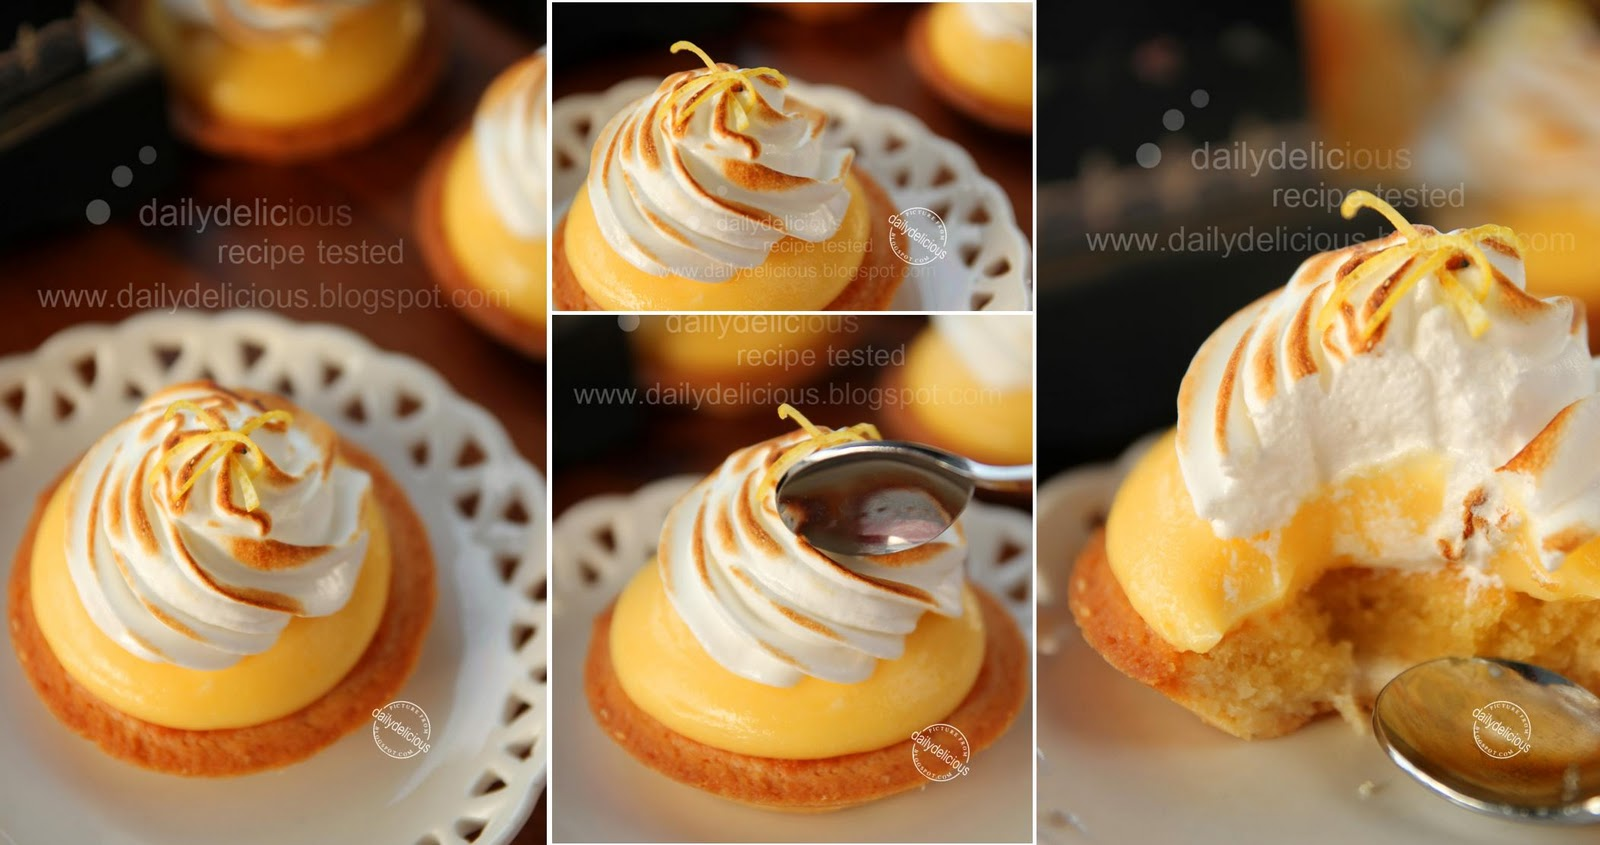 dailydelicious Tartelette au Citron Meringue My favorite